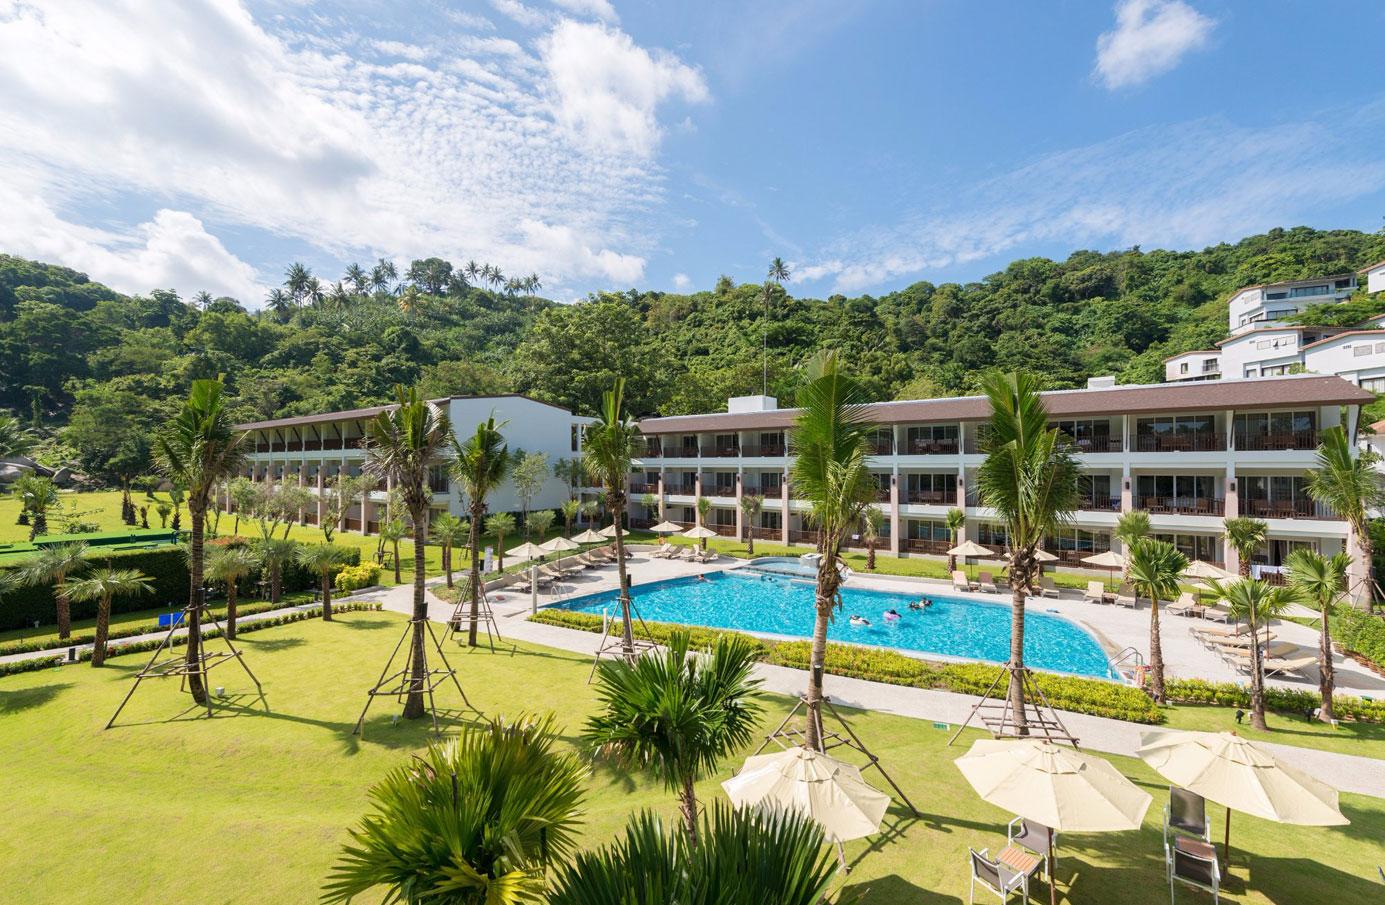 phuket-wedding-garden-katatani (1)